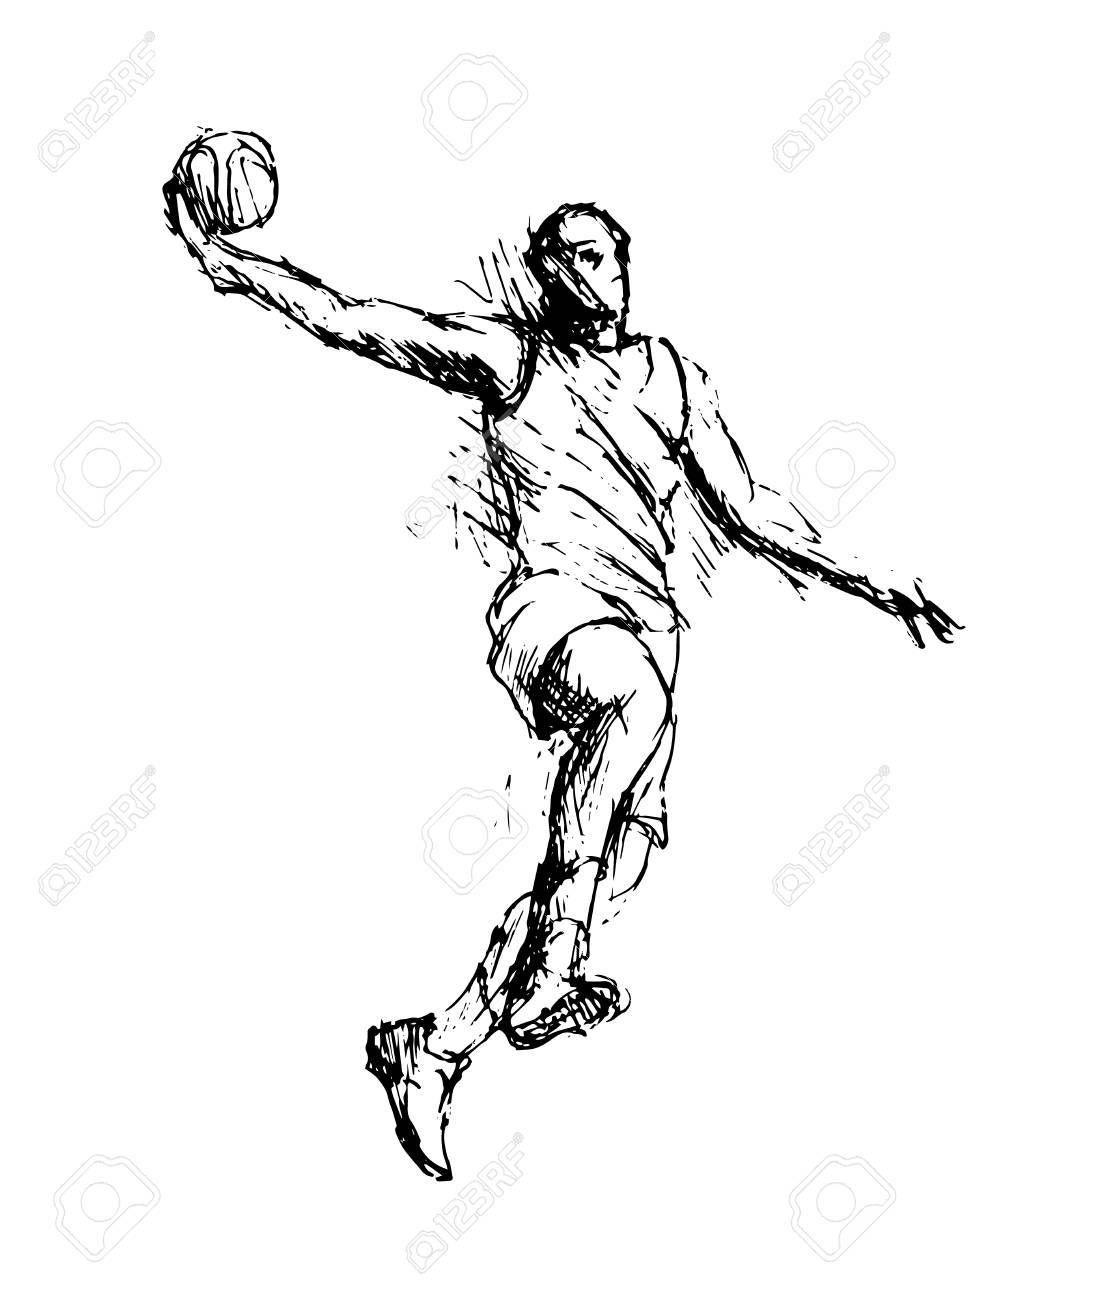 Hand Sketch Basketball Player Vector Illustration Aff Basketball Sketch Hand Illustration Vect Hand Sketch Basketball Players Vector Illustration